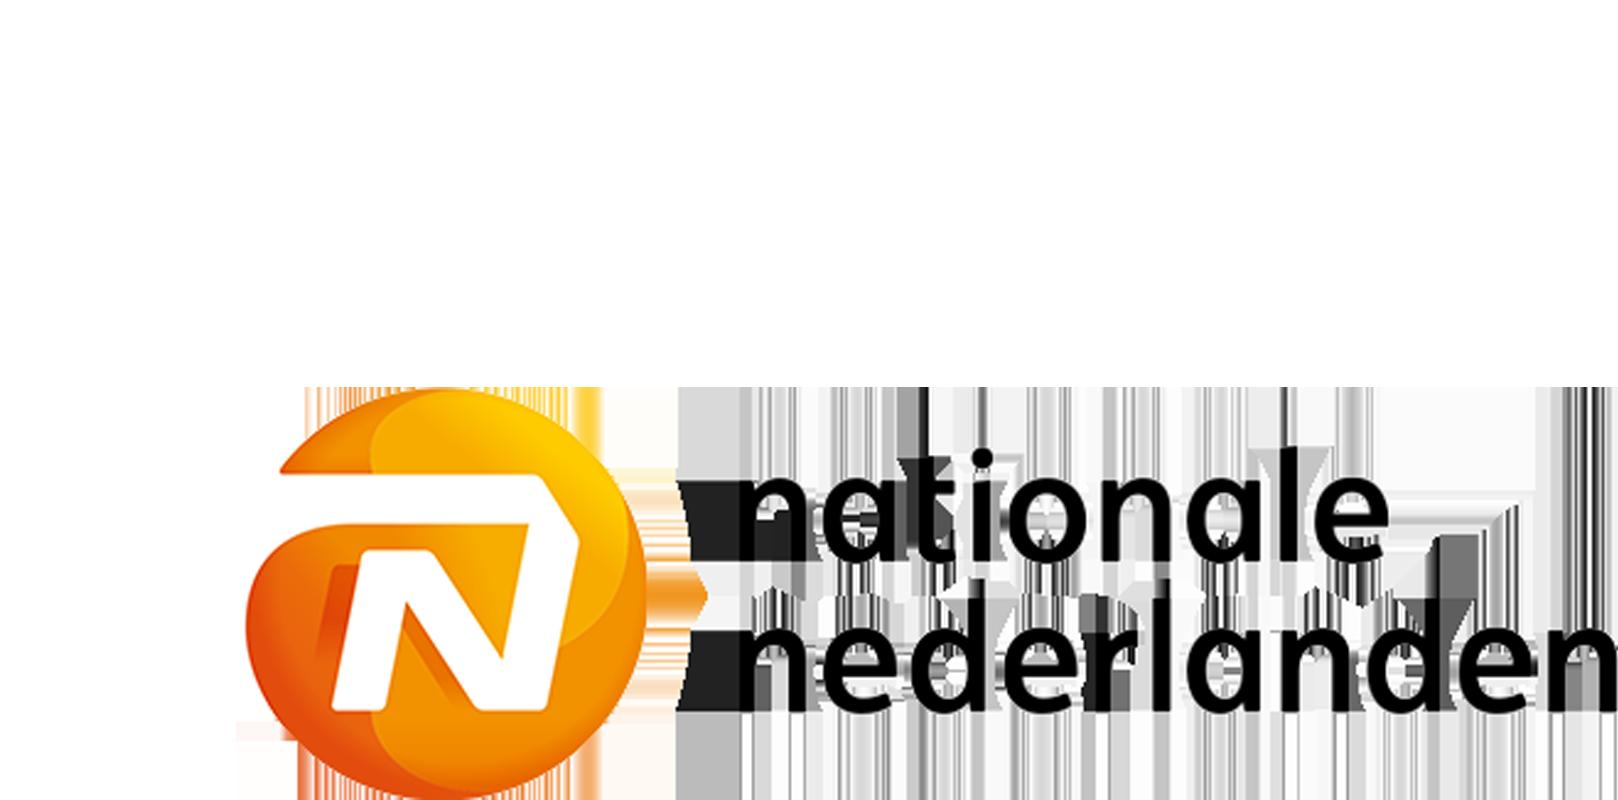 https://overwater-volmacht.nl/wp-content/uploads/2020/03/logo-nn-1.png